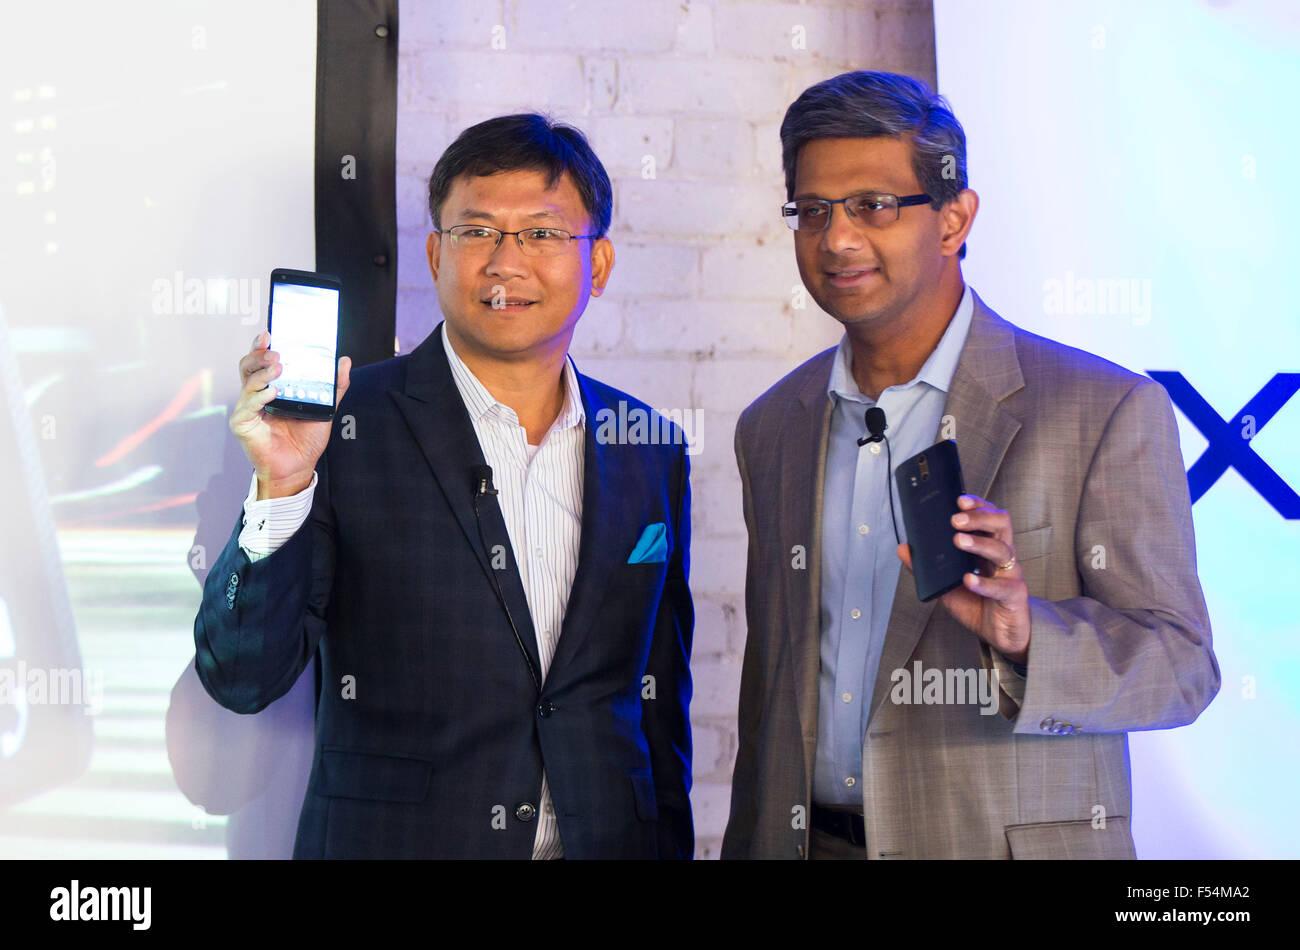 (151027) -- TORONTO, Oct. 27, 2015 (Xinhua) -- Raj Doshi (R), executive vice president of Canadian Wireless Consumer Stock Photo